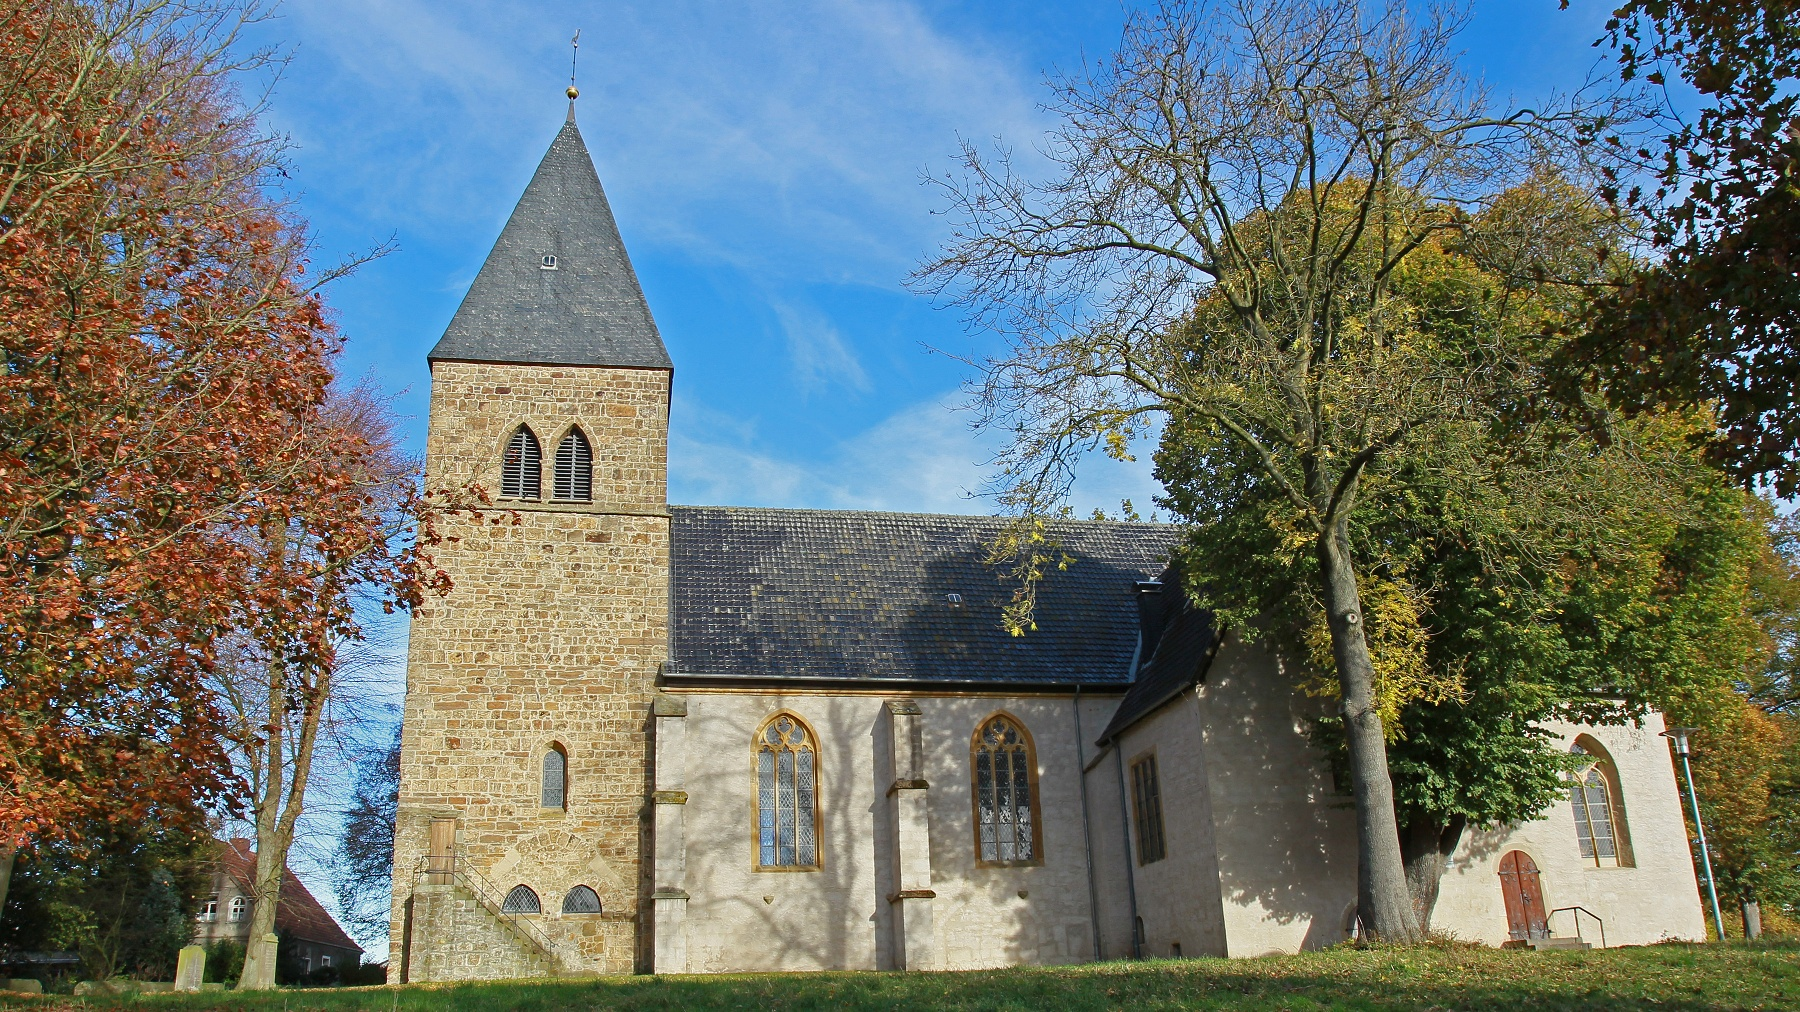 Stiftskirche Stift Quernheim